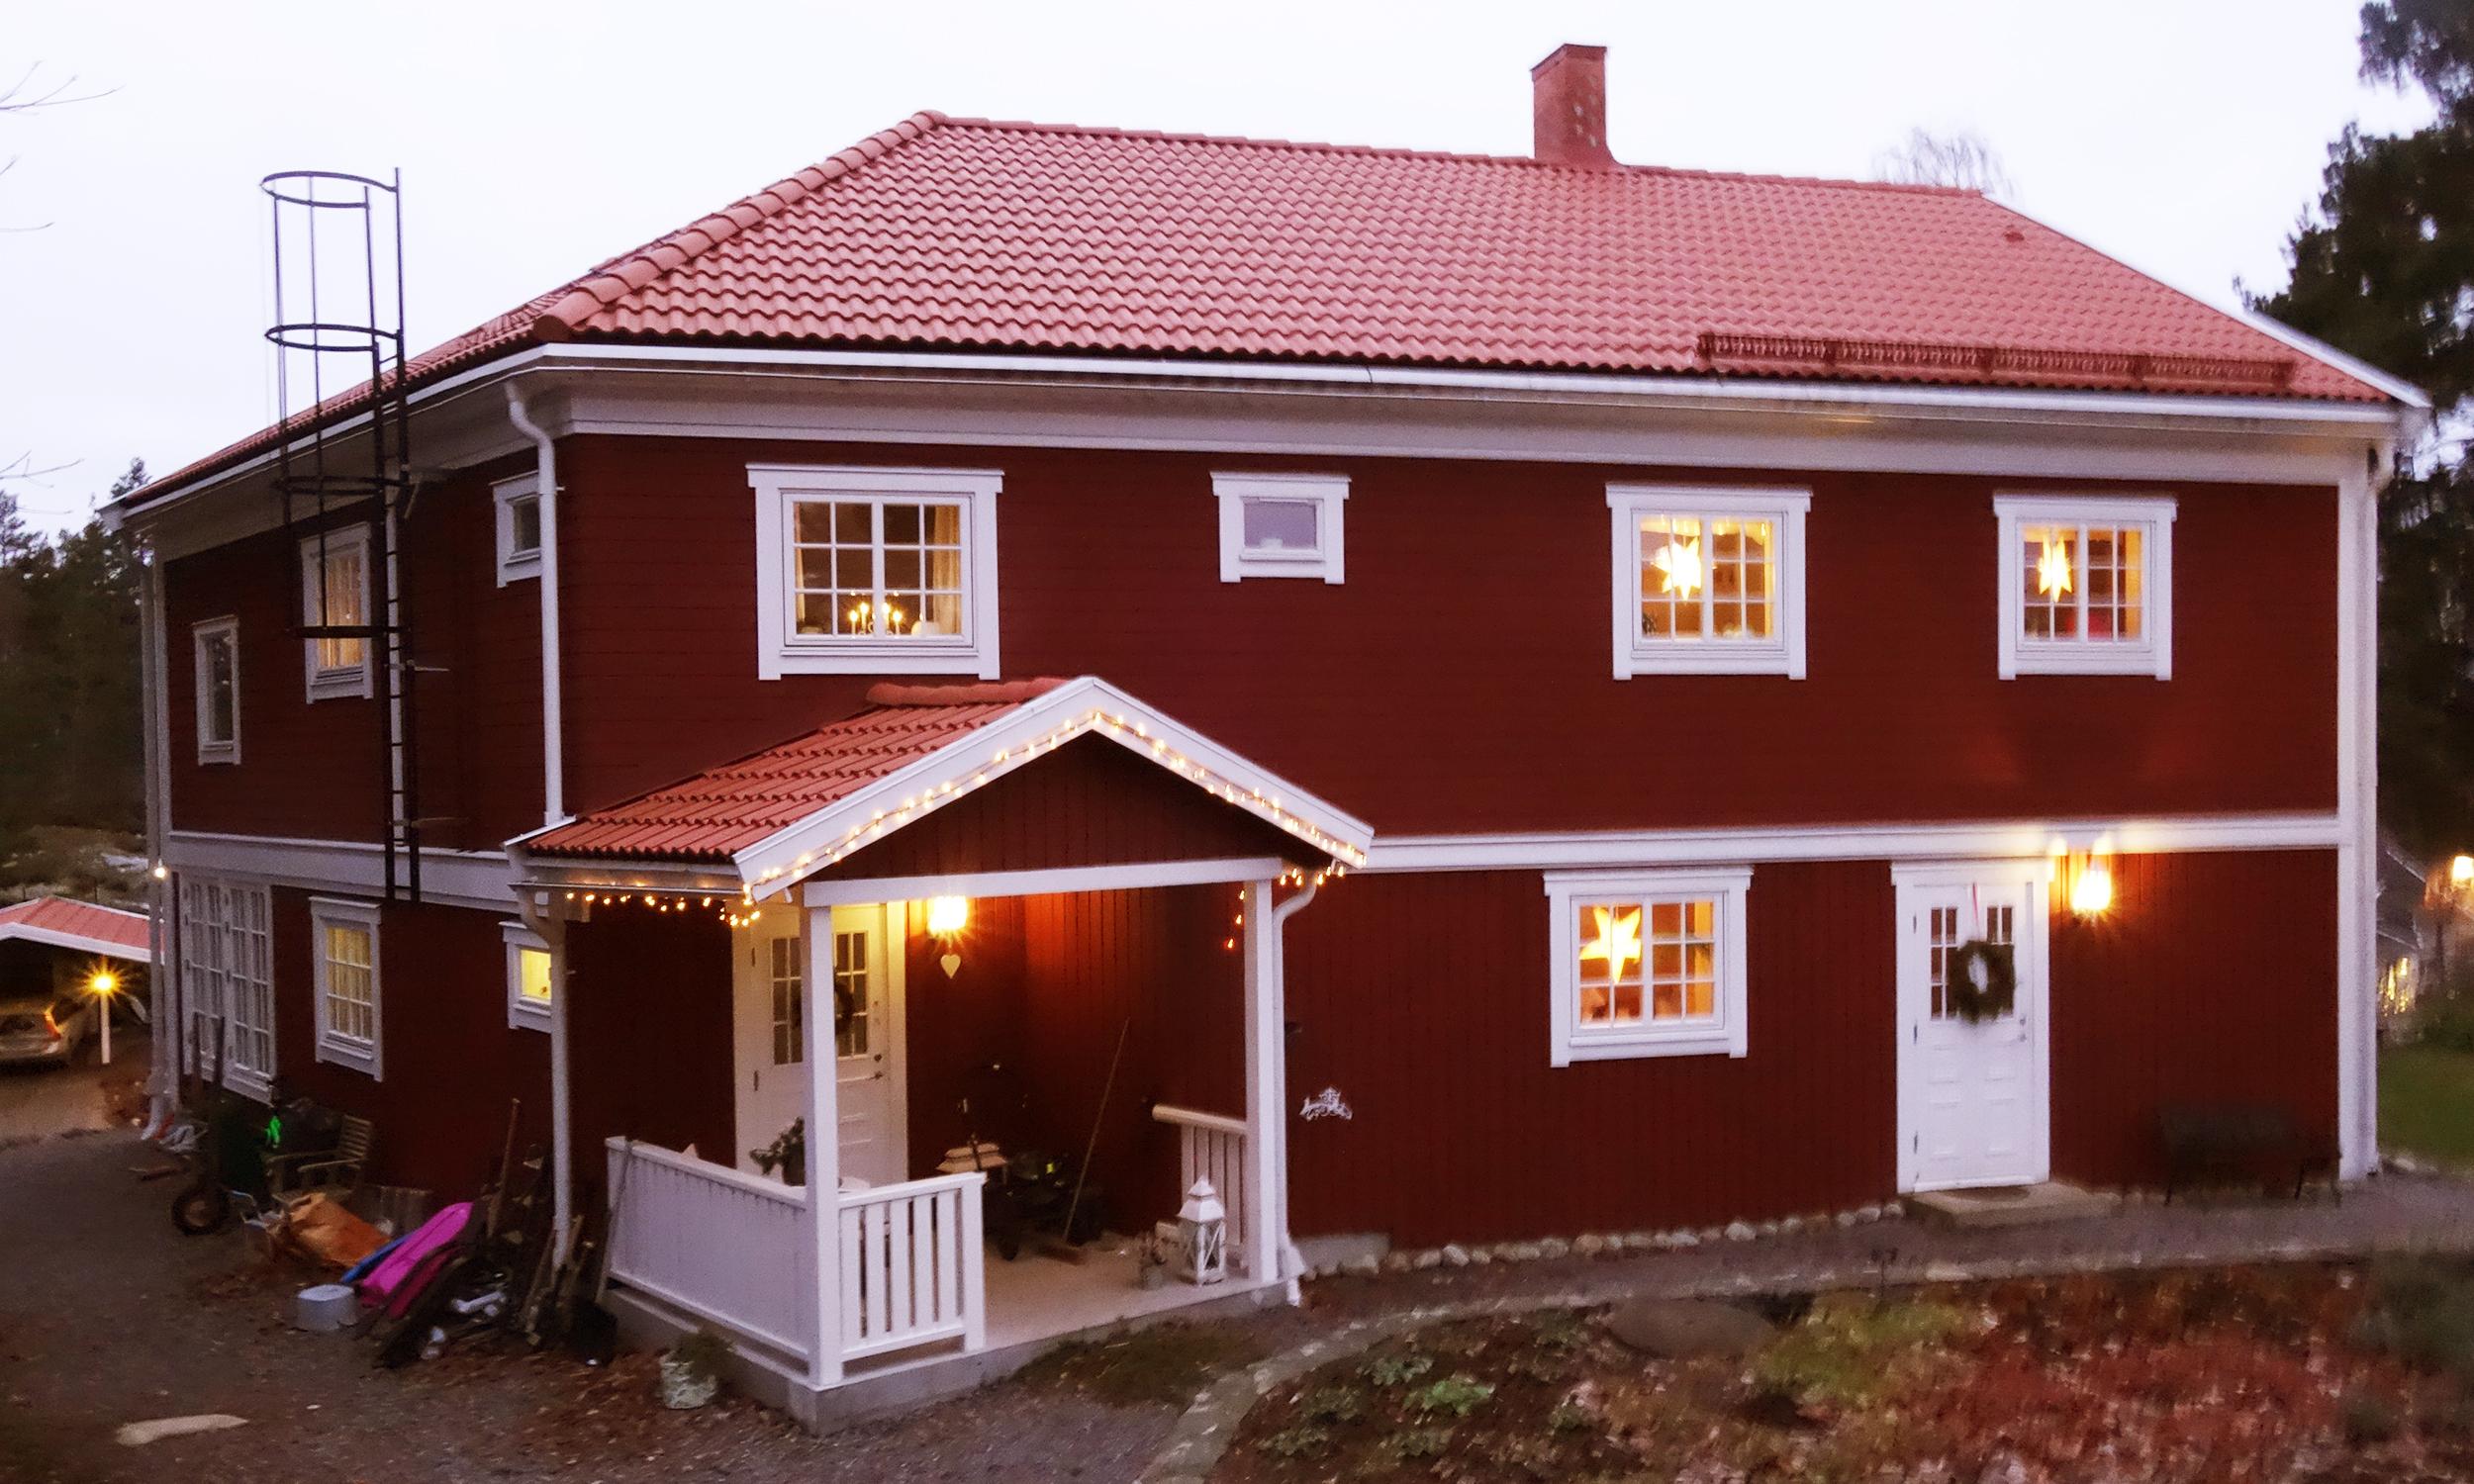 House_Asastigen_sergiomonterobravo_2